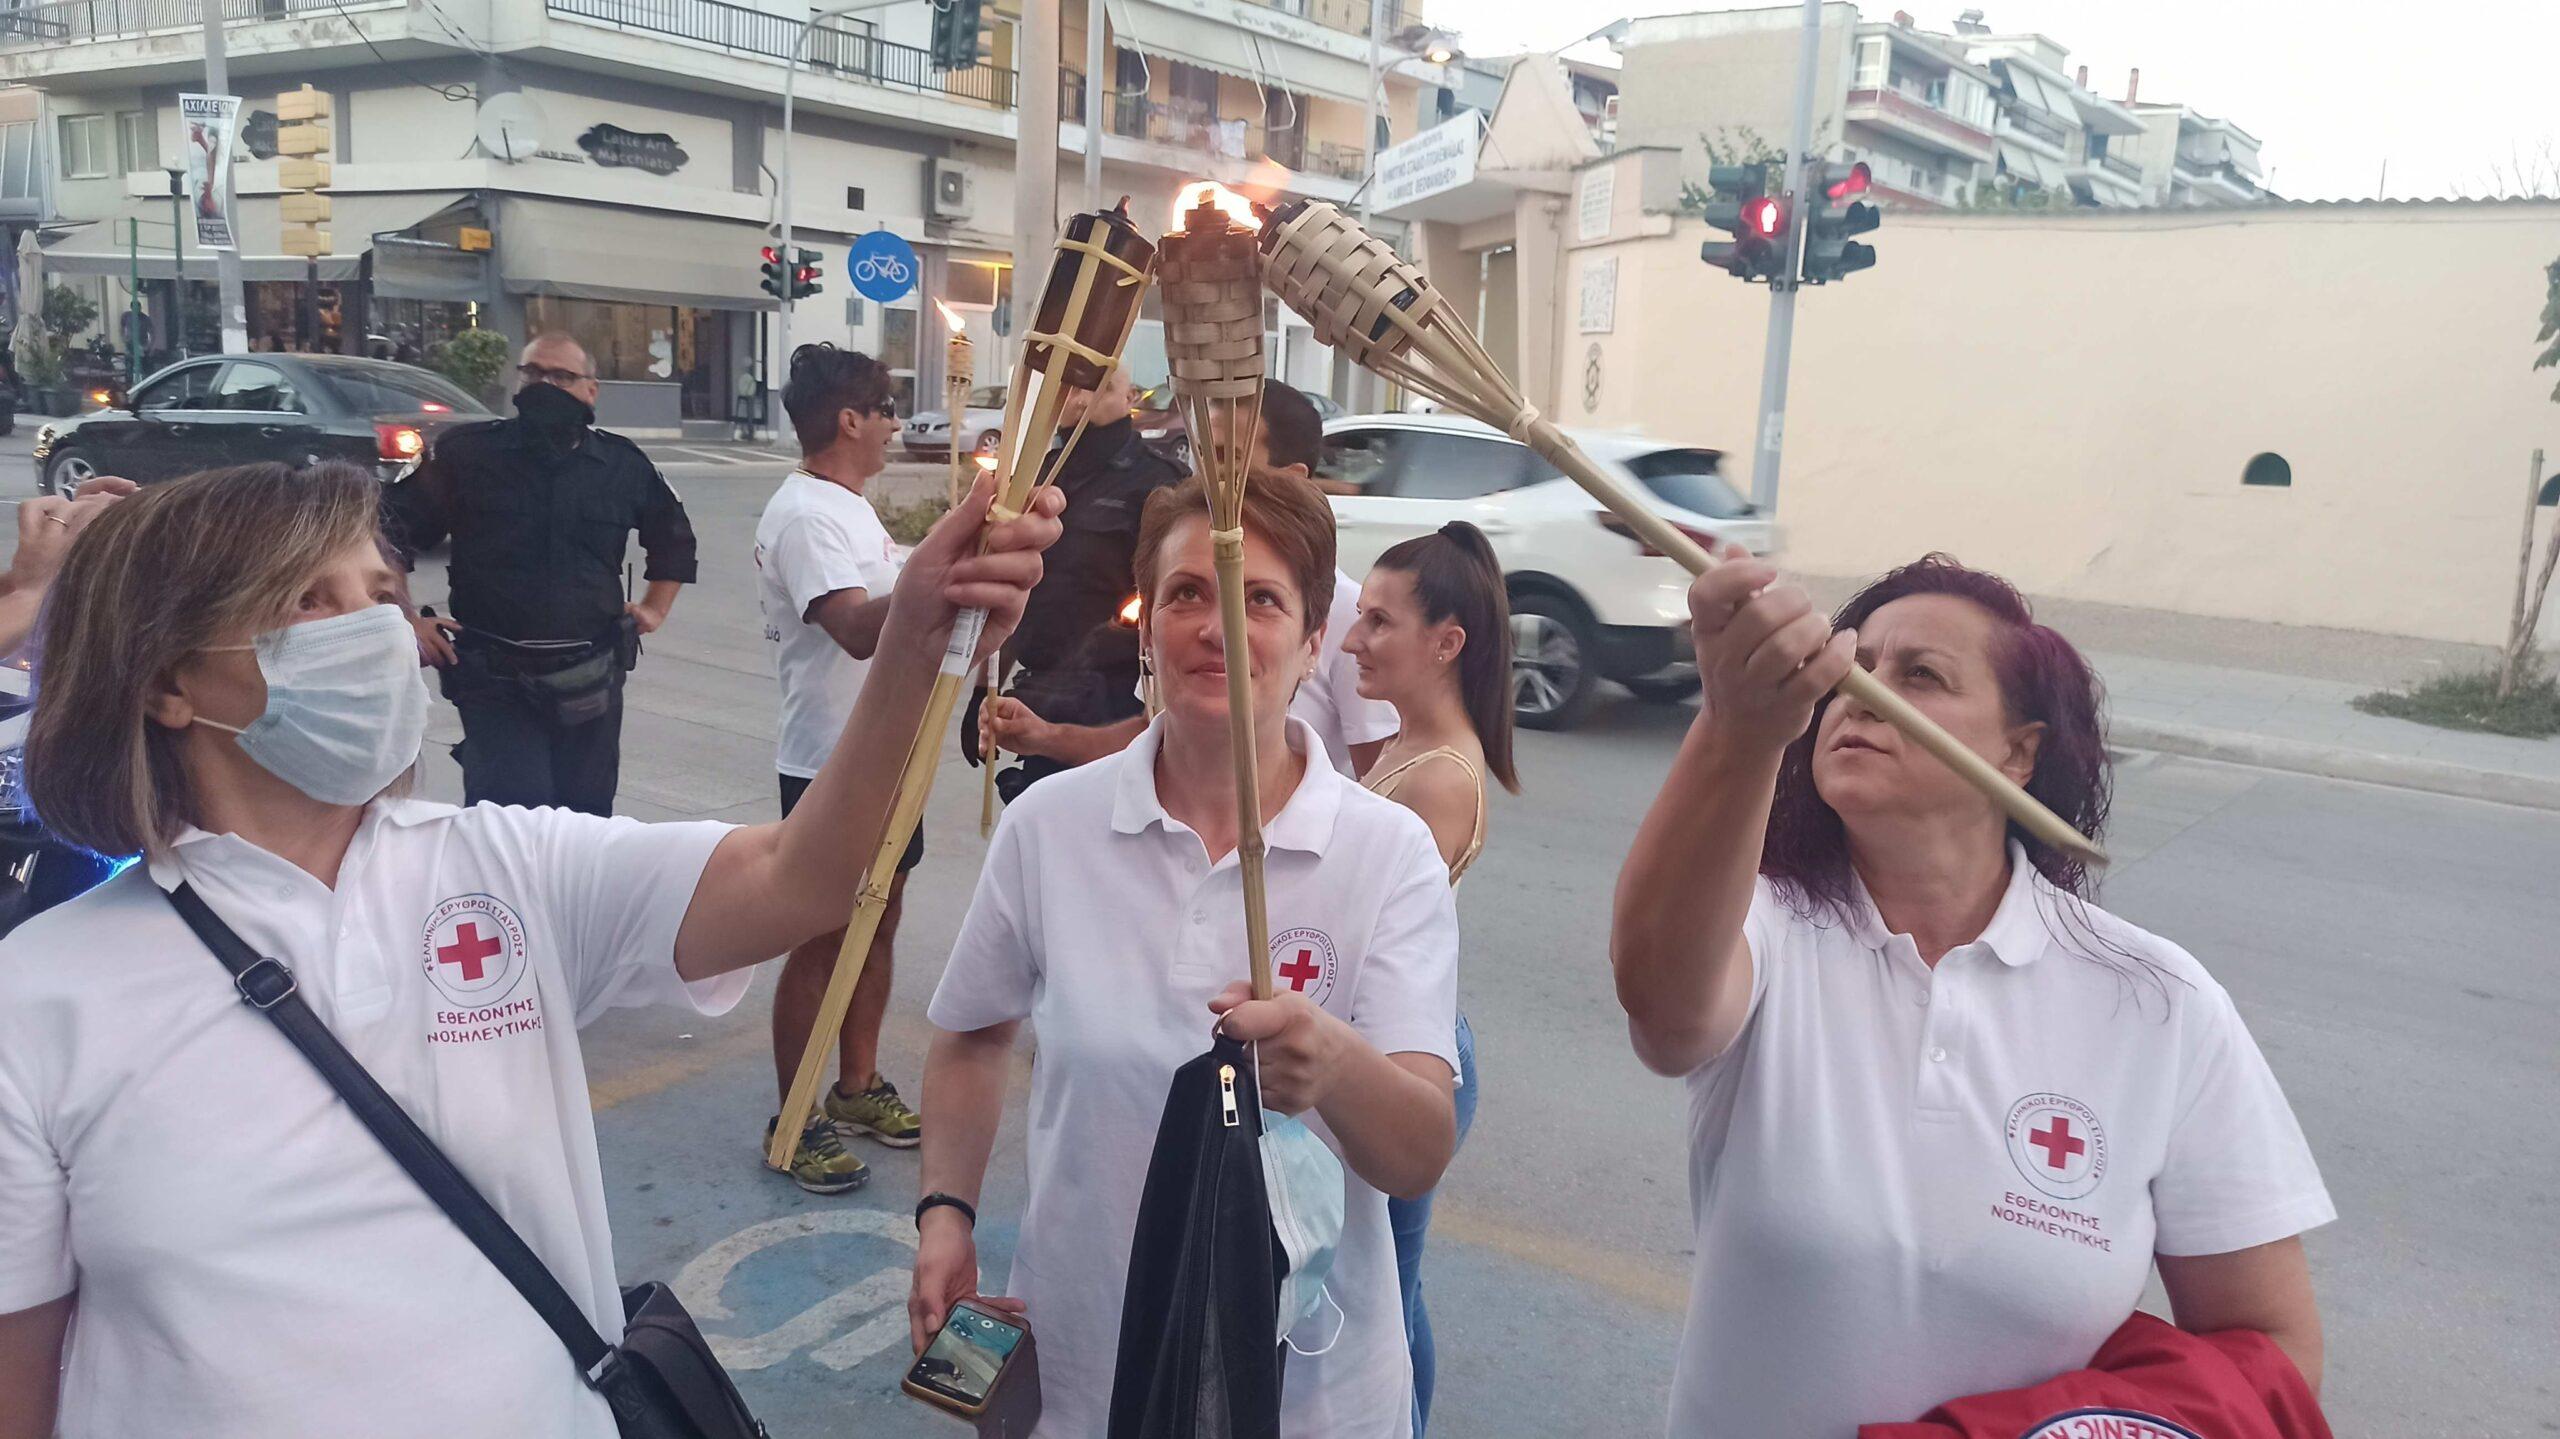 Eordaialive.com: O Δήμος Εορδαίας Συμμετείχε στην Ευρωπαϊκή Εβδομάδα Κινητικότητας (βίντεο-φωτο) 23